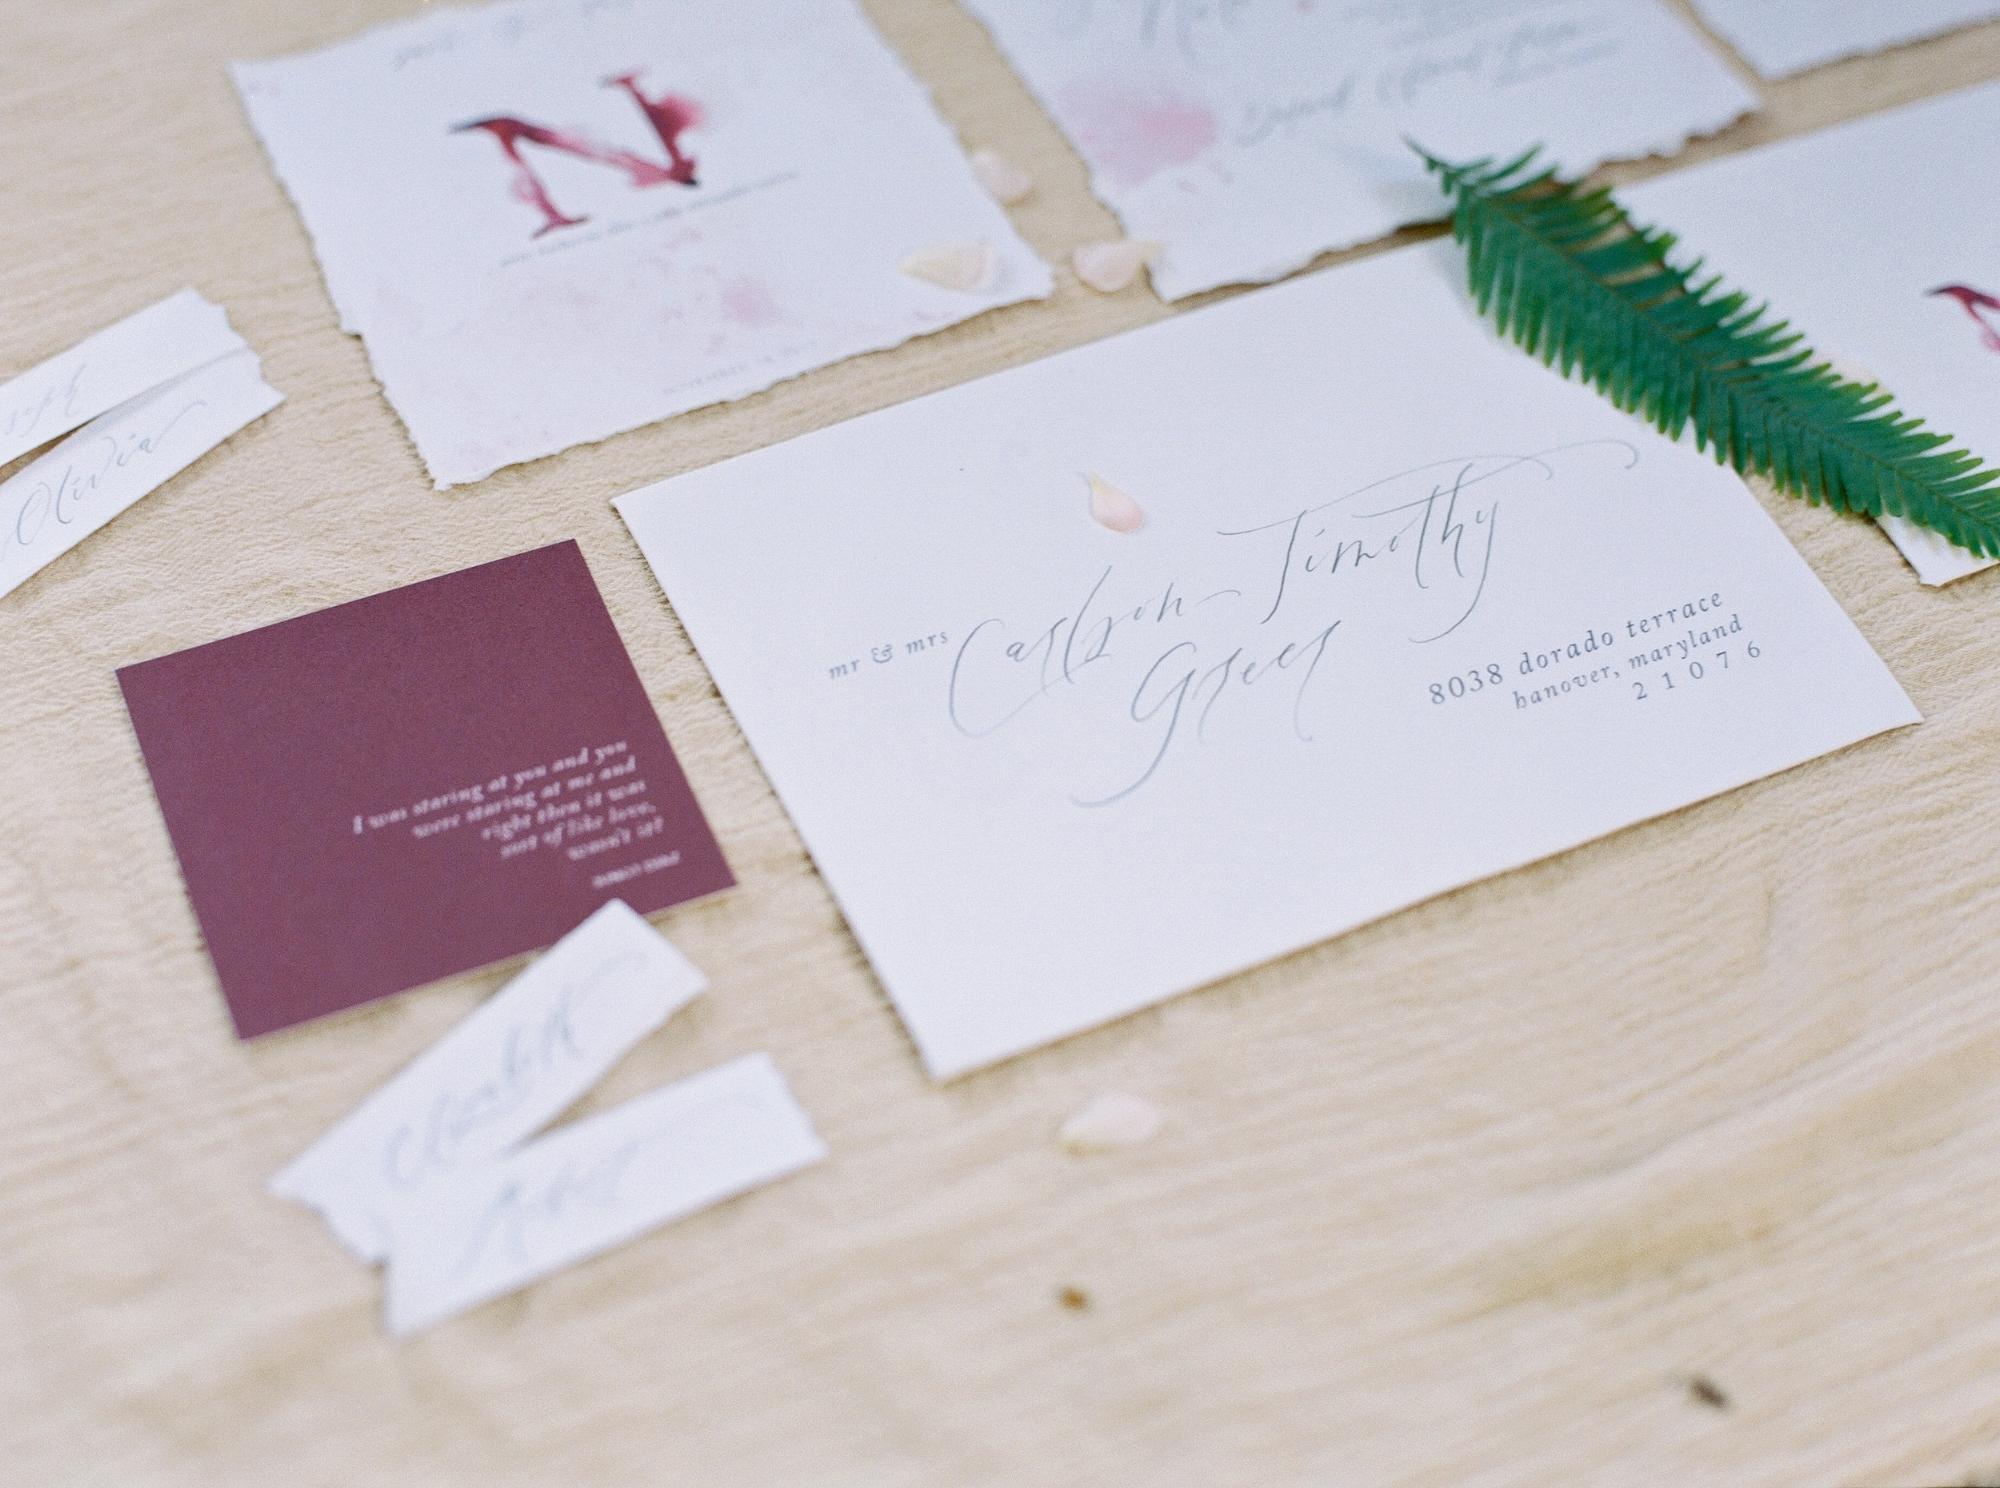 Boutique-DC-MD-VA-Event-Planner-Wedding-Designer-A-Griffin-Events-Fall-Elopement5.jpg